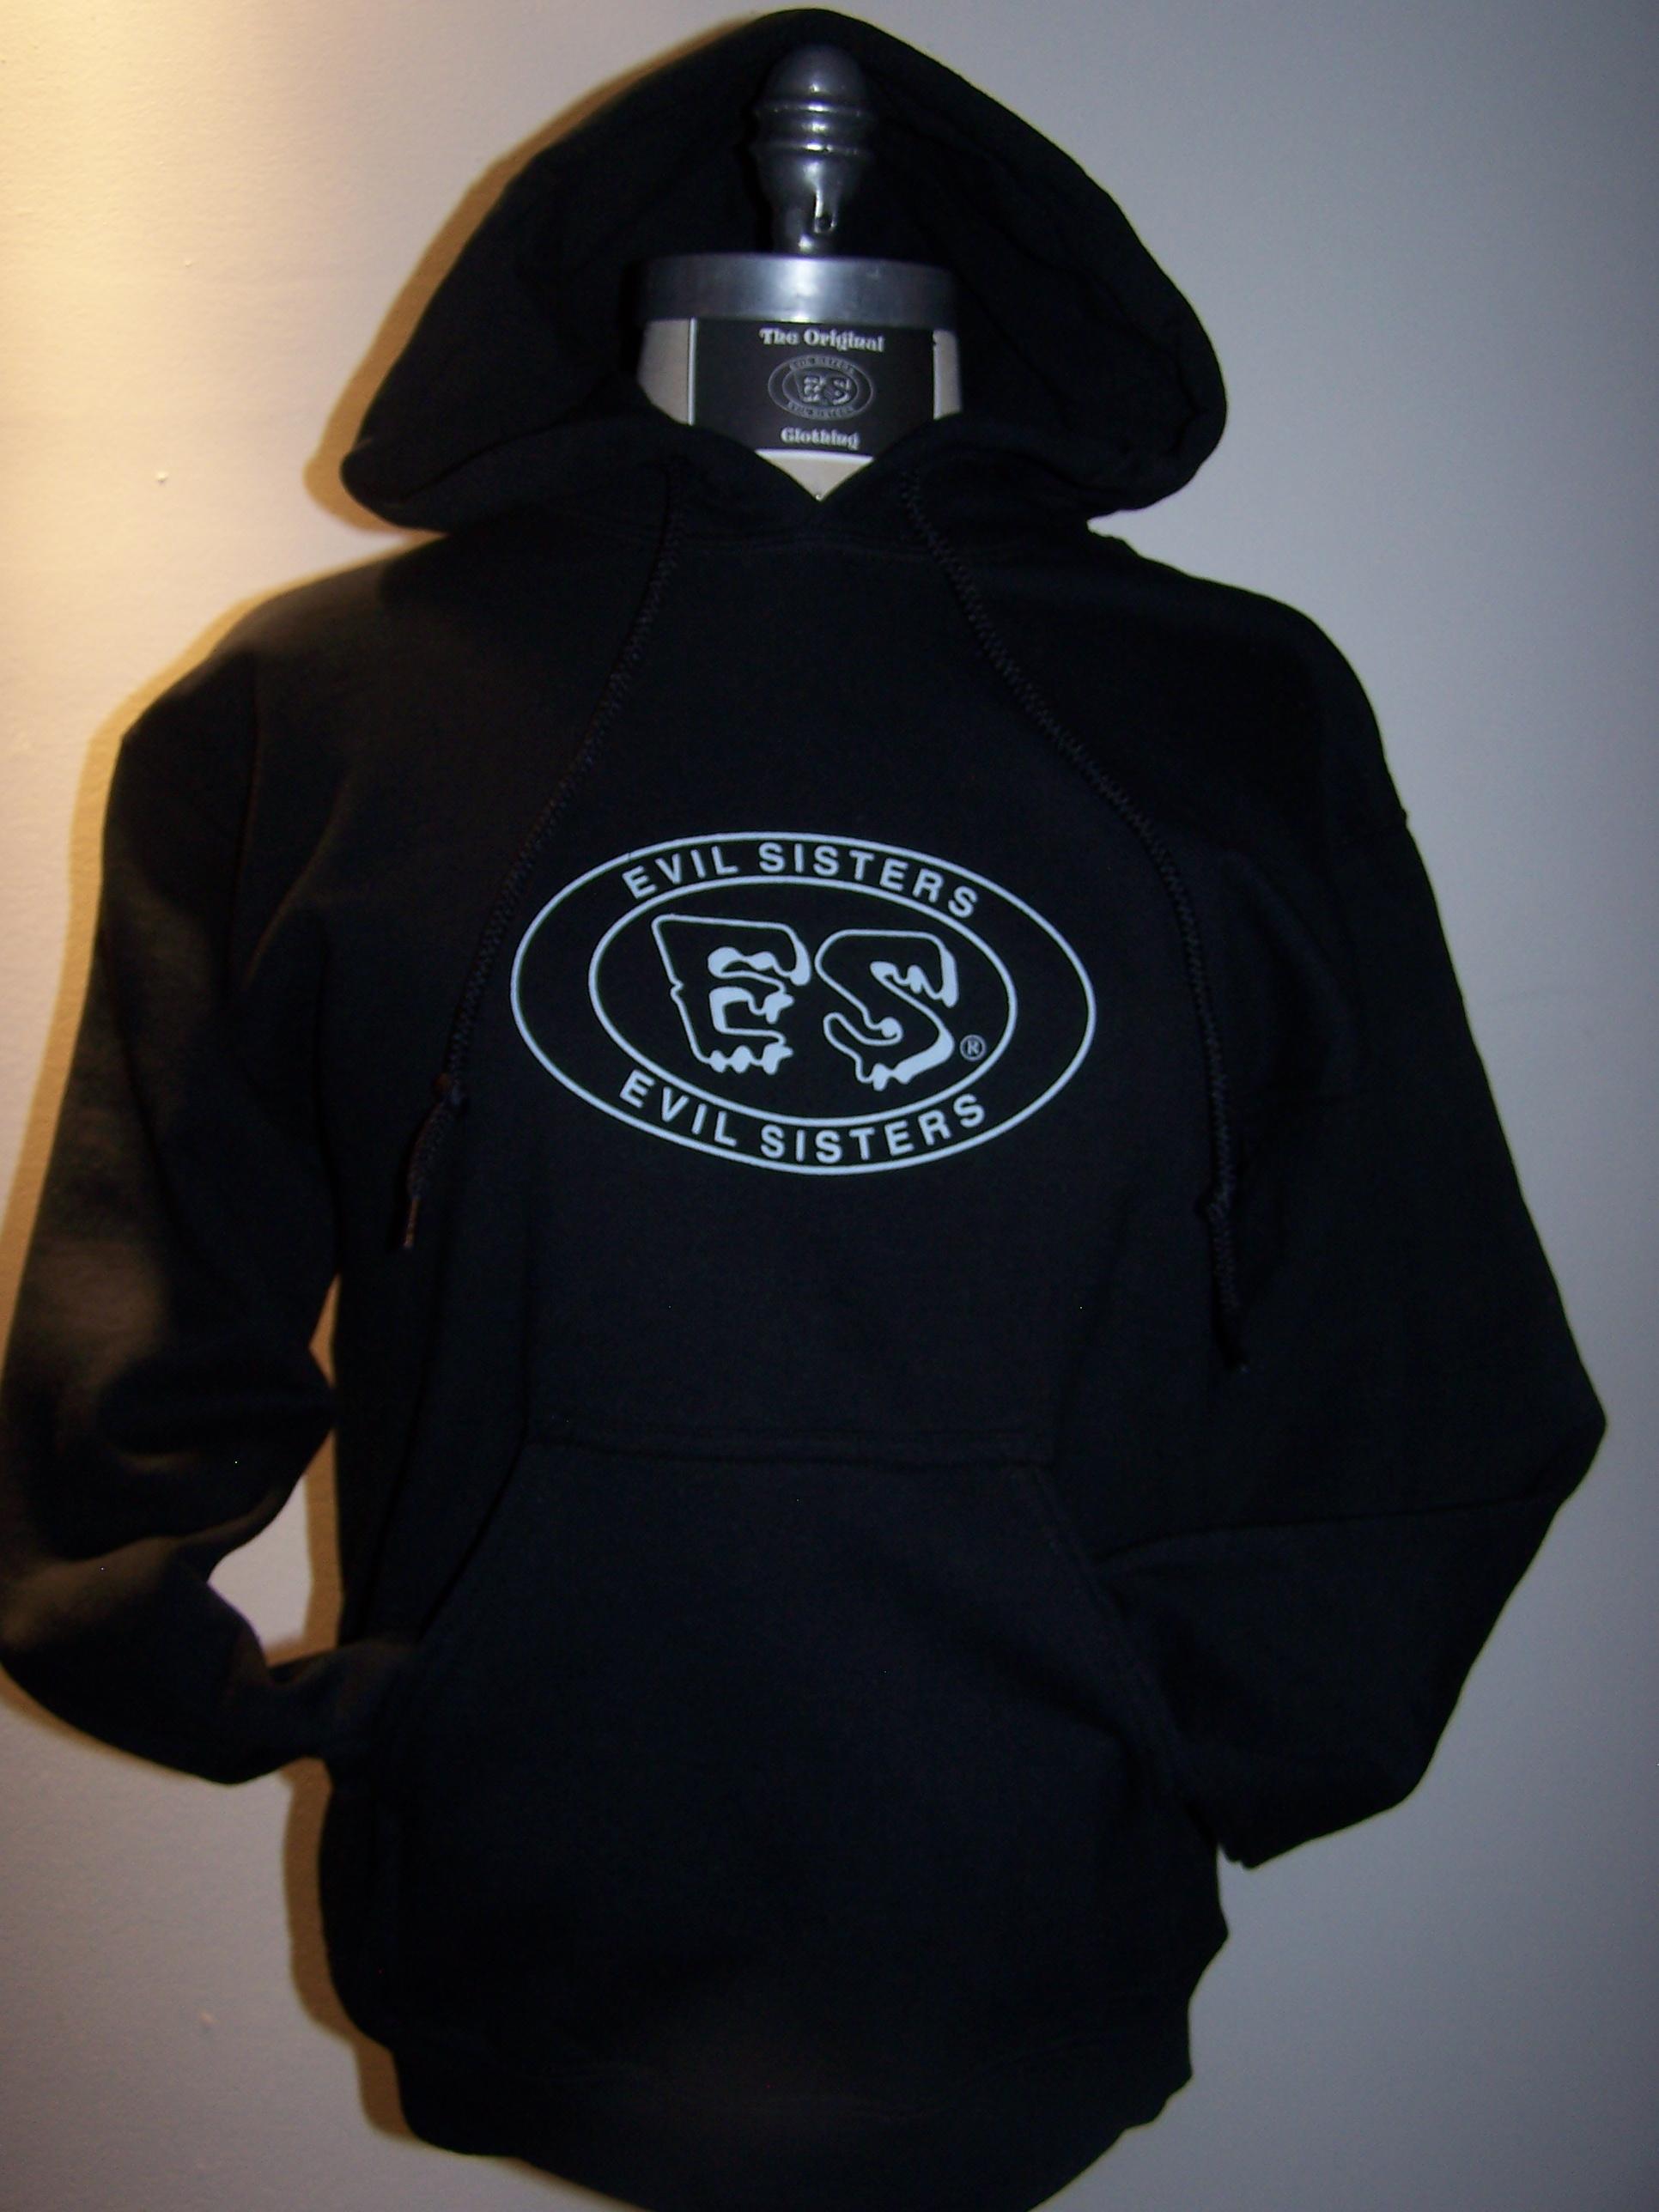 Decree Hooded Sweatshirt